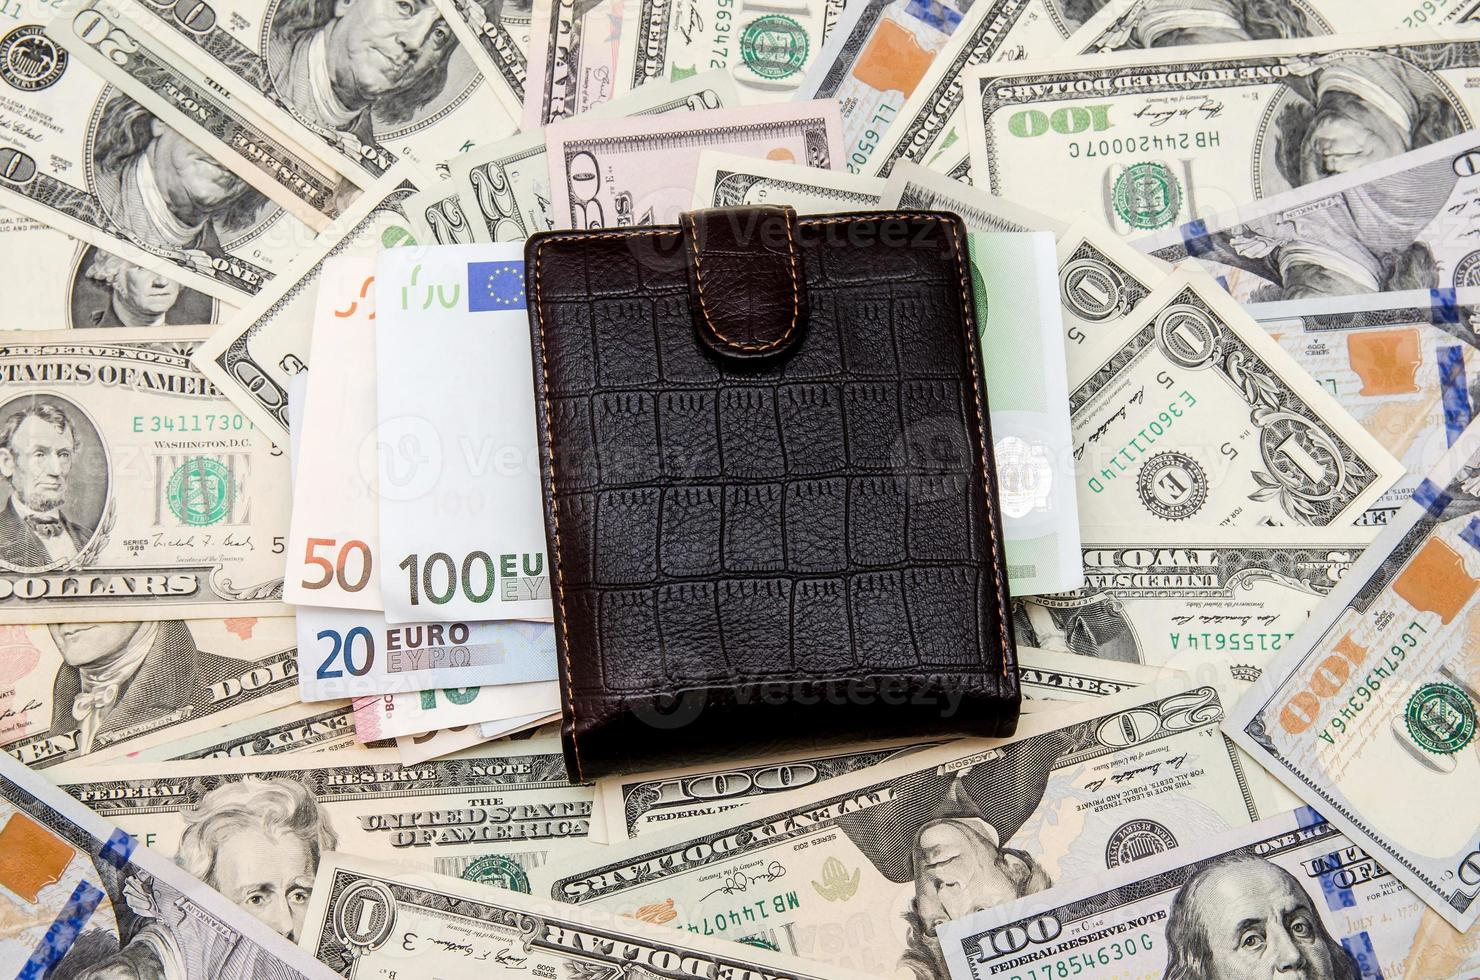 billetera con dinero como fondo foto